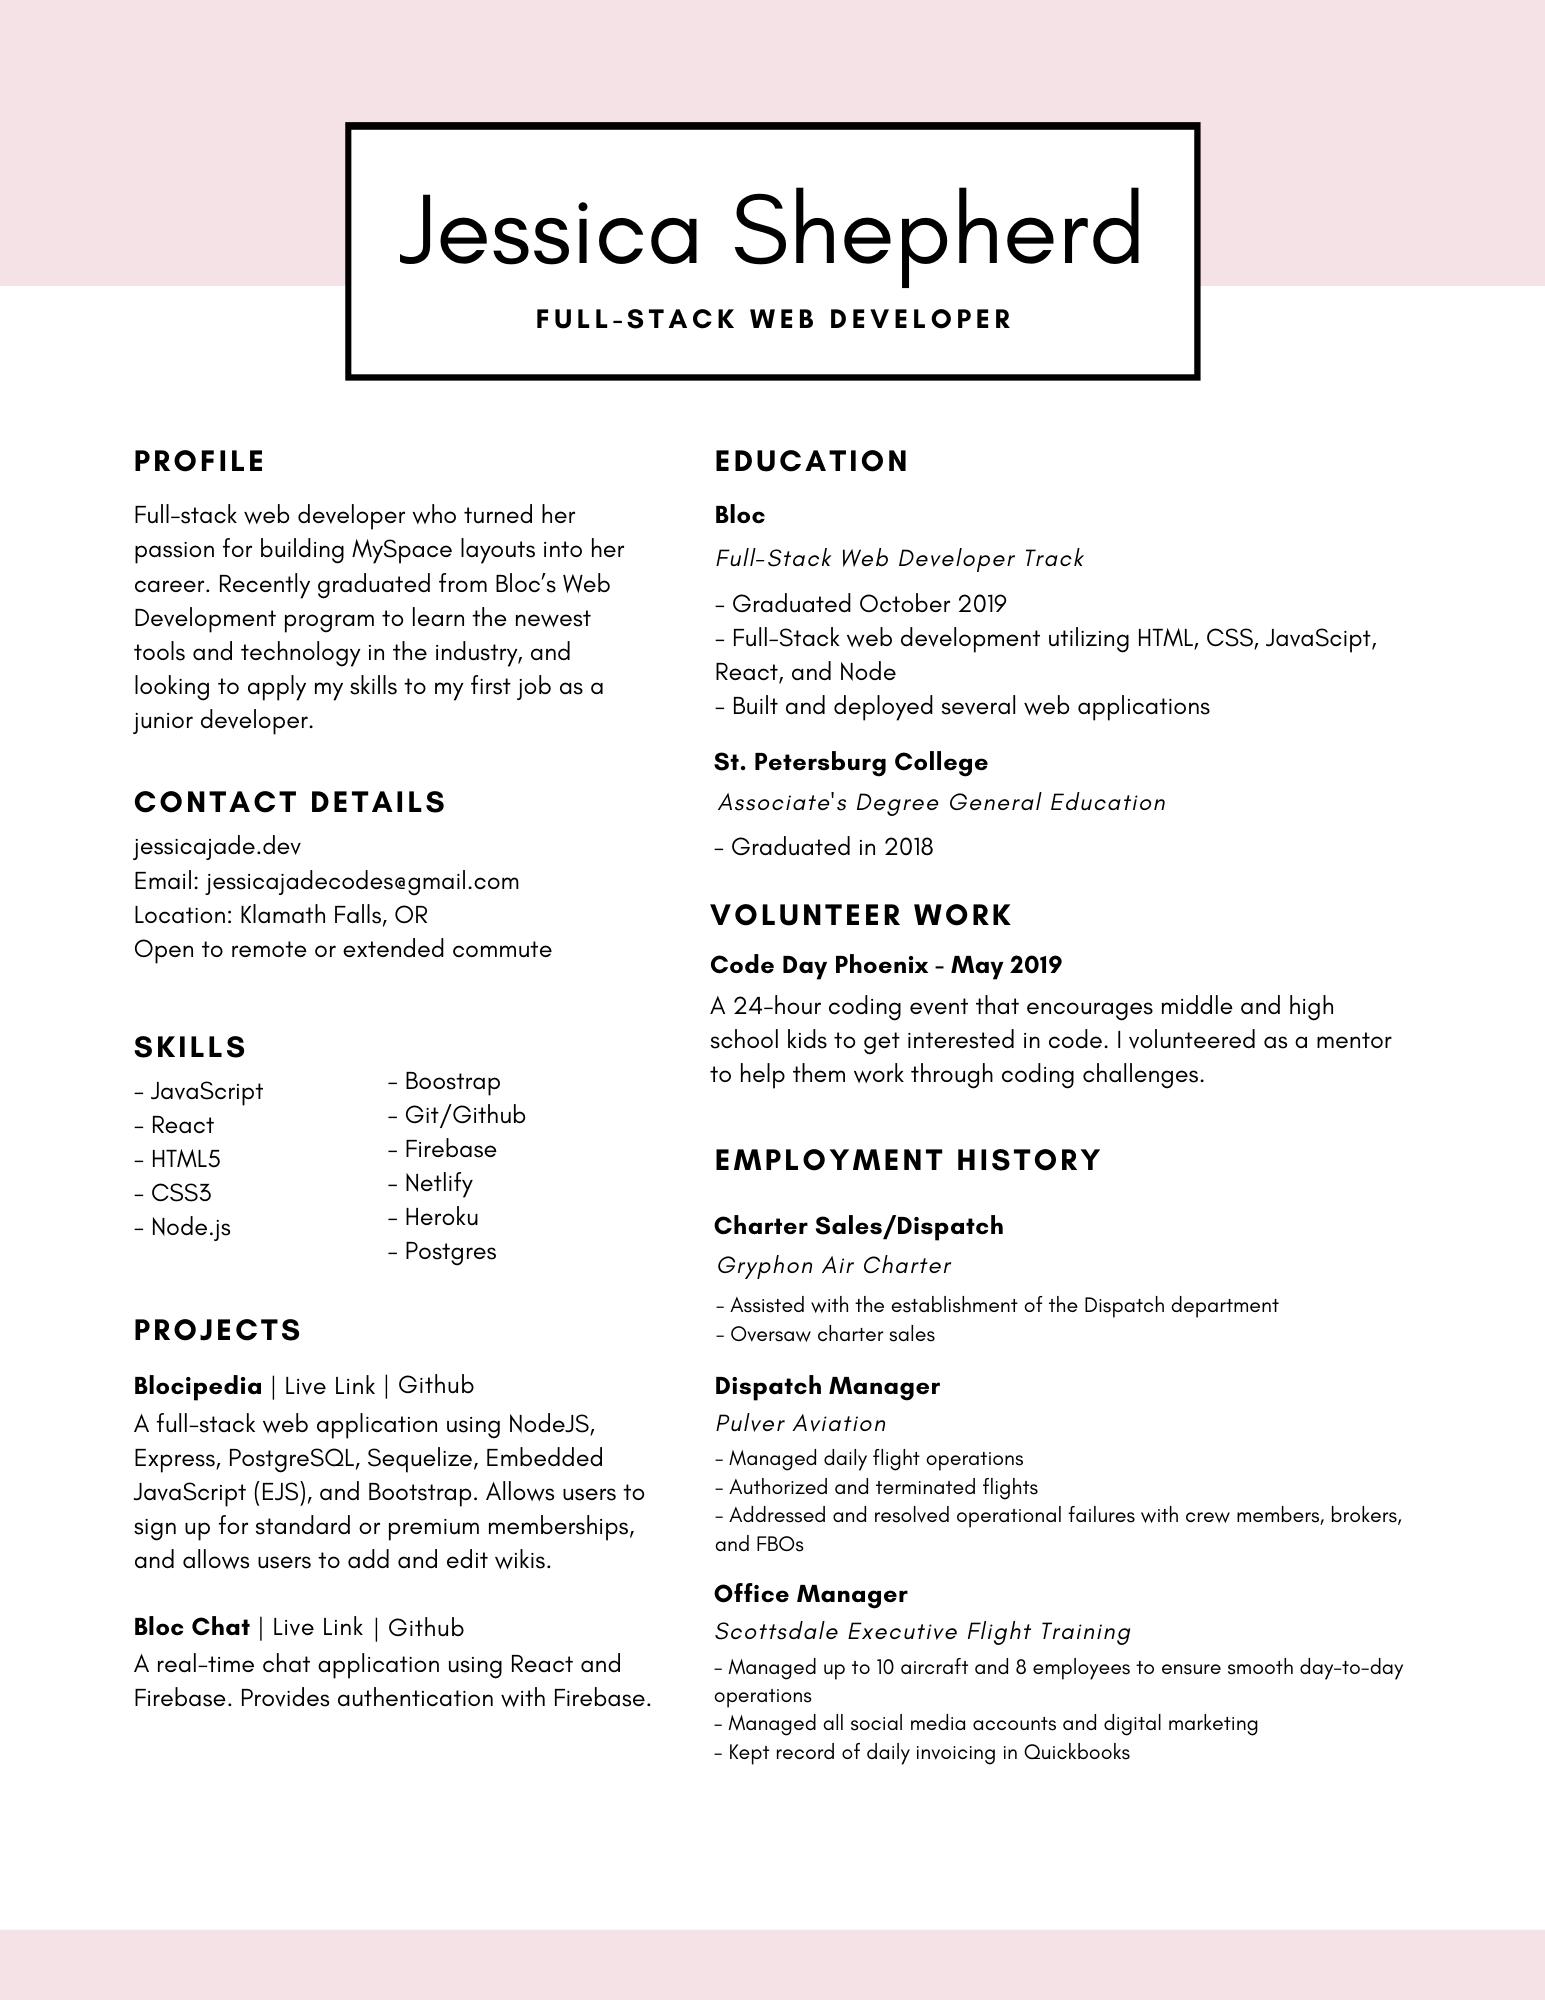 Jessica Shepherd | Resume